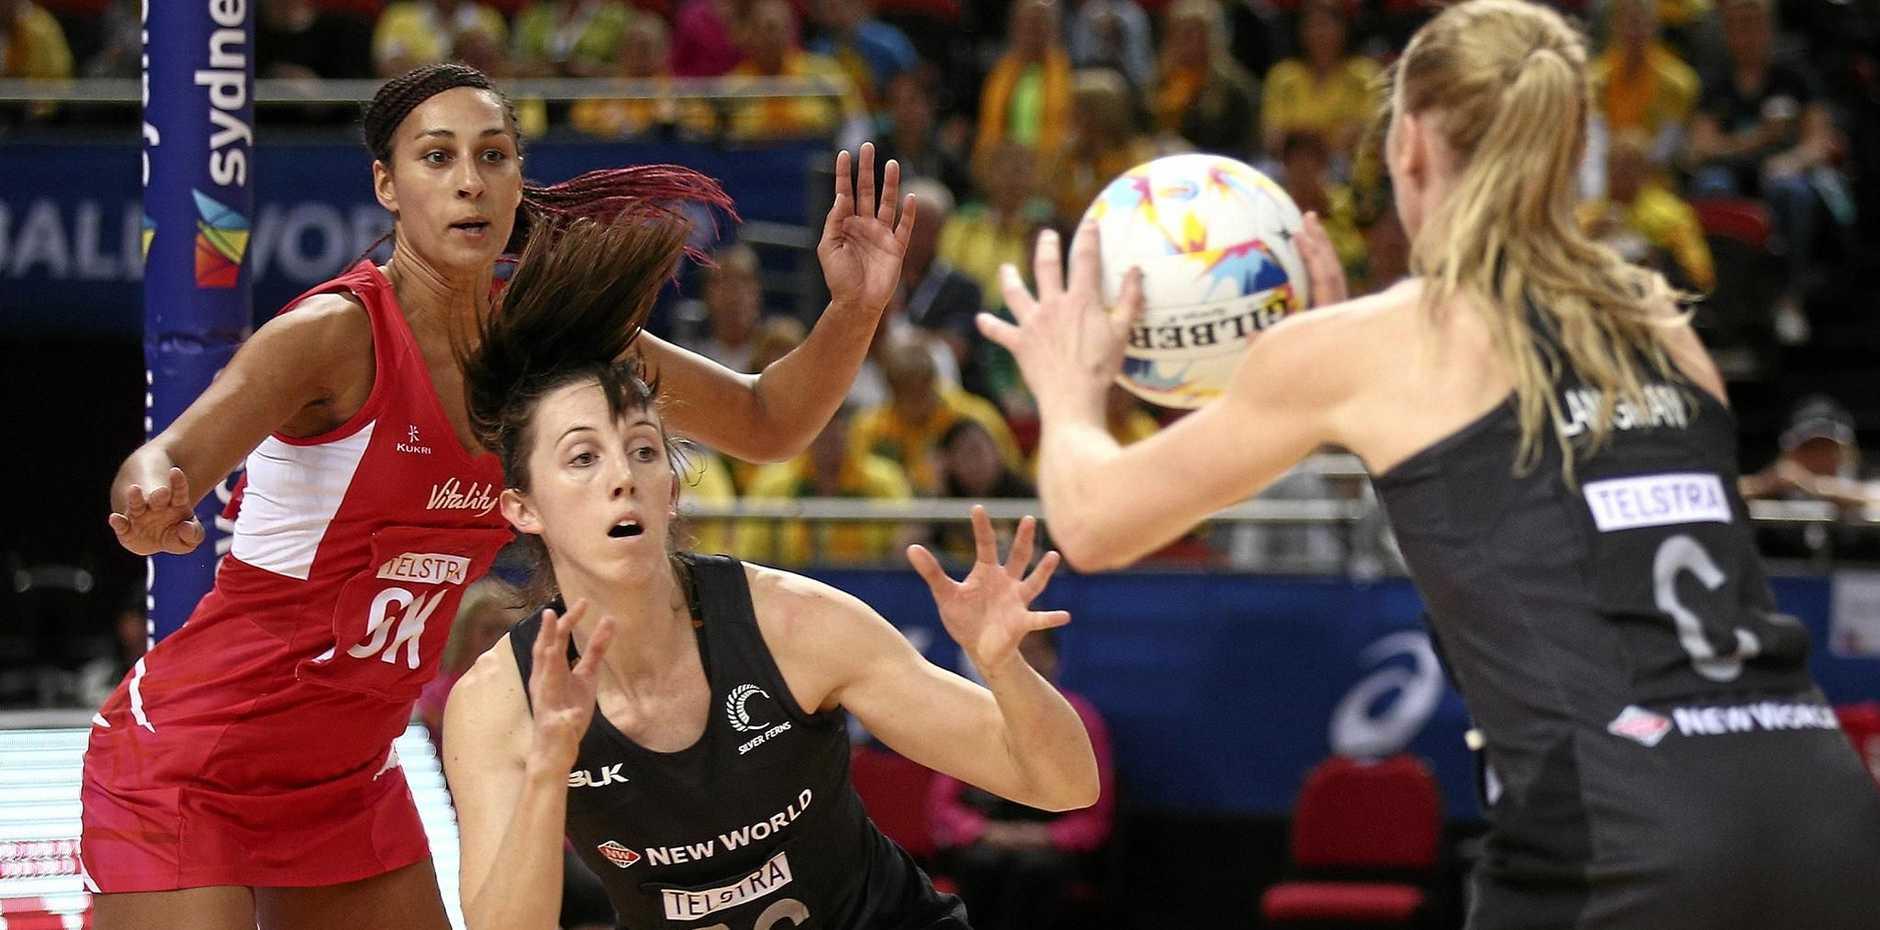 BIG SIGNING: England's Geva Mentor, left, will play for the Sunshine Coast Lightning.